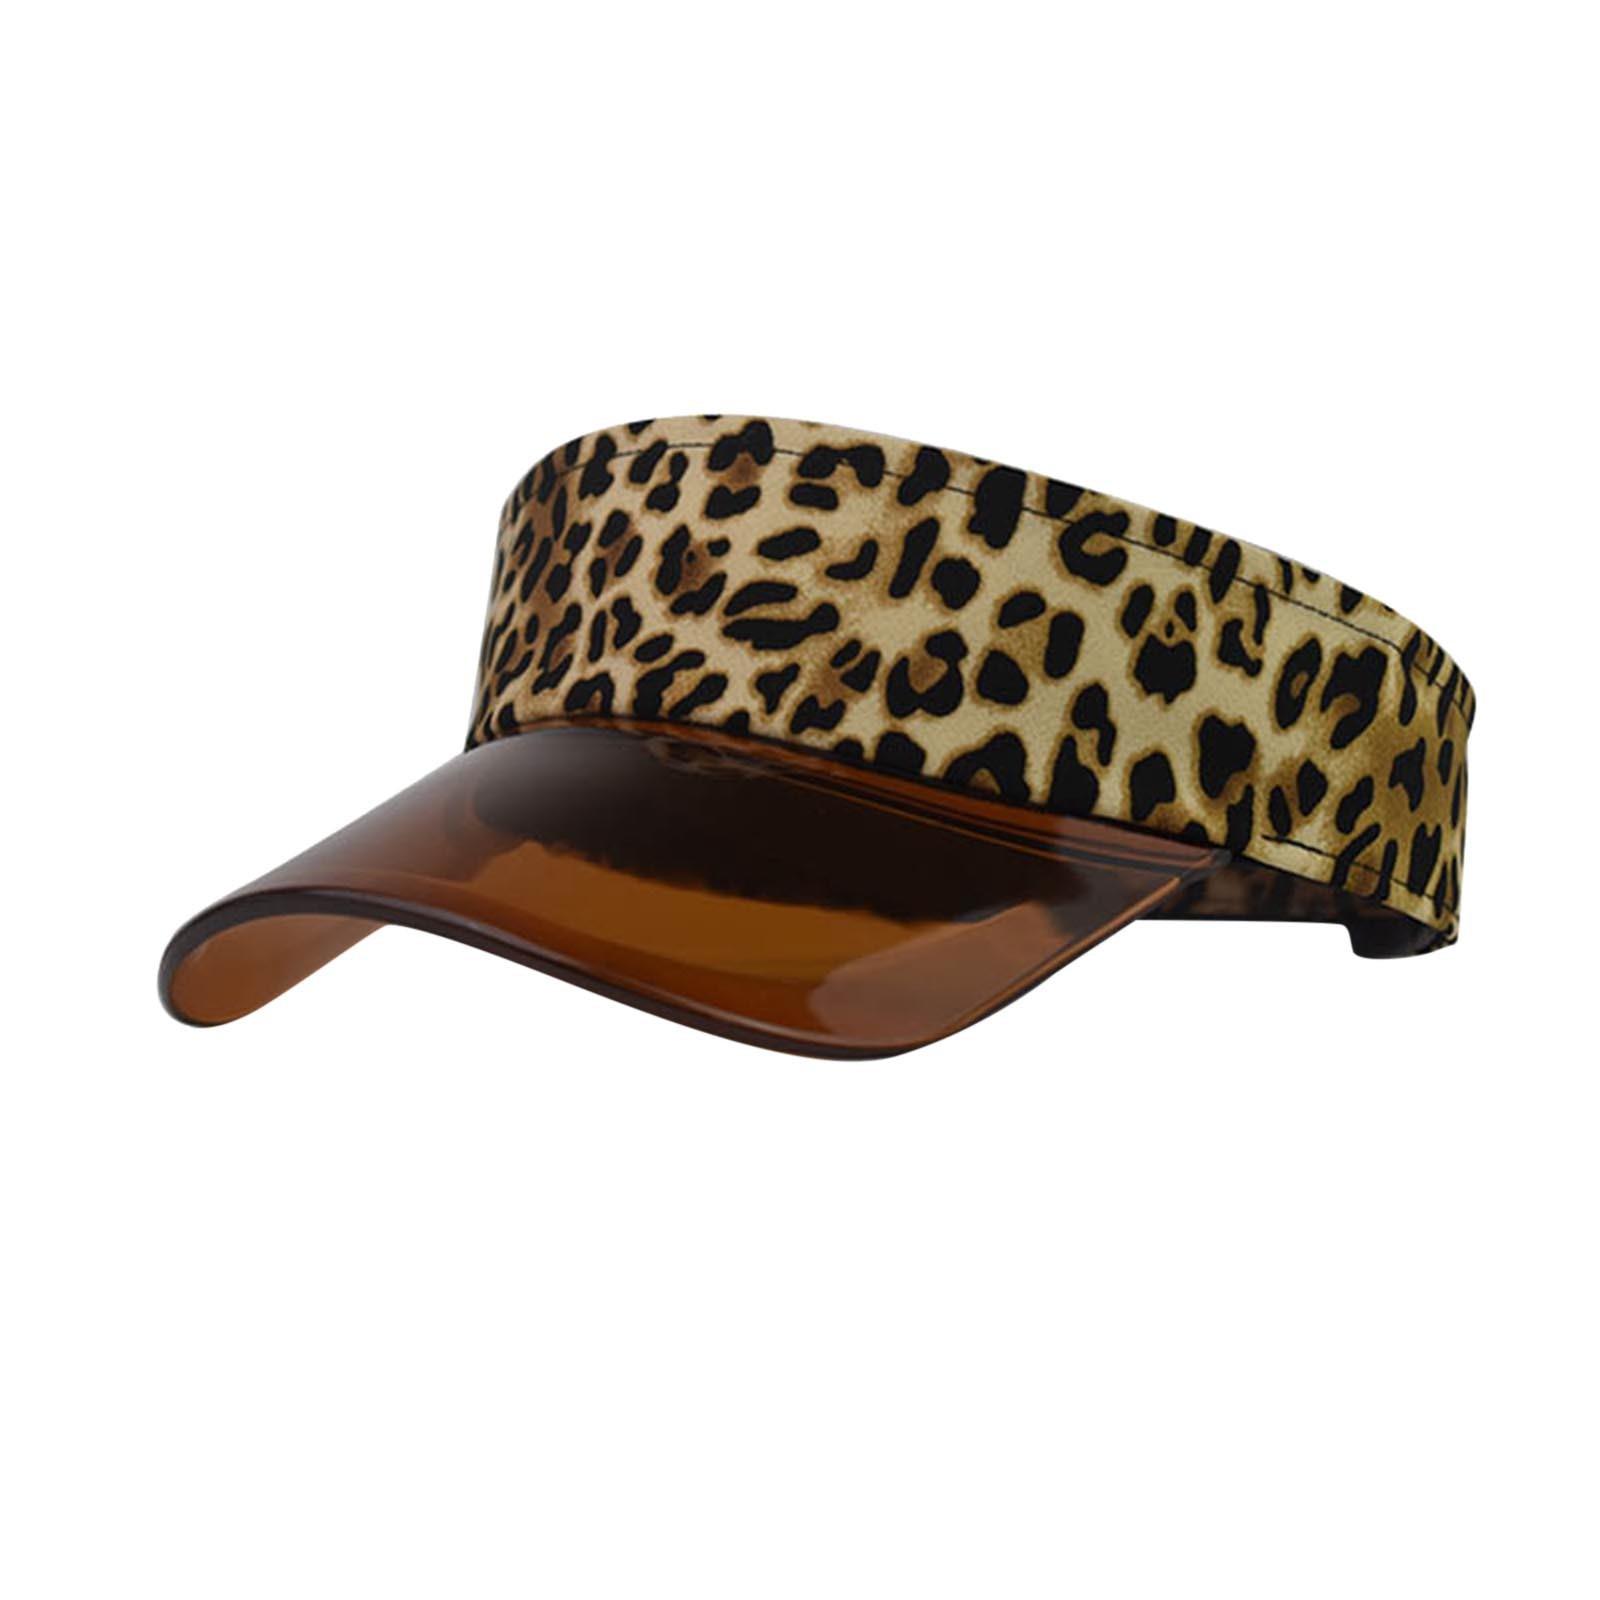 Sombreros militares de moda Para Mujer, sombrero de sol con estampado de leopardo, protección Uv, visera superior, gorra de béisbol, Gorras de baile sexys Para Mujer